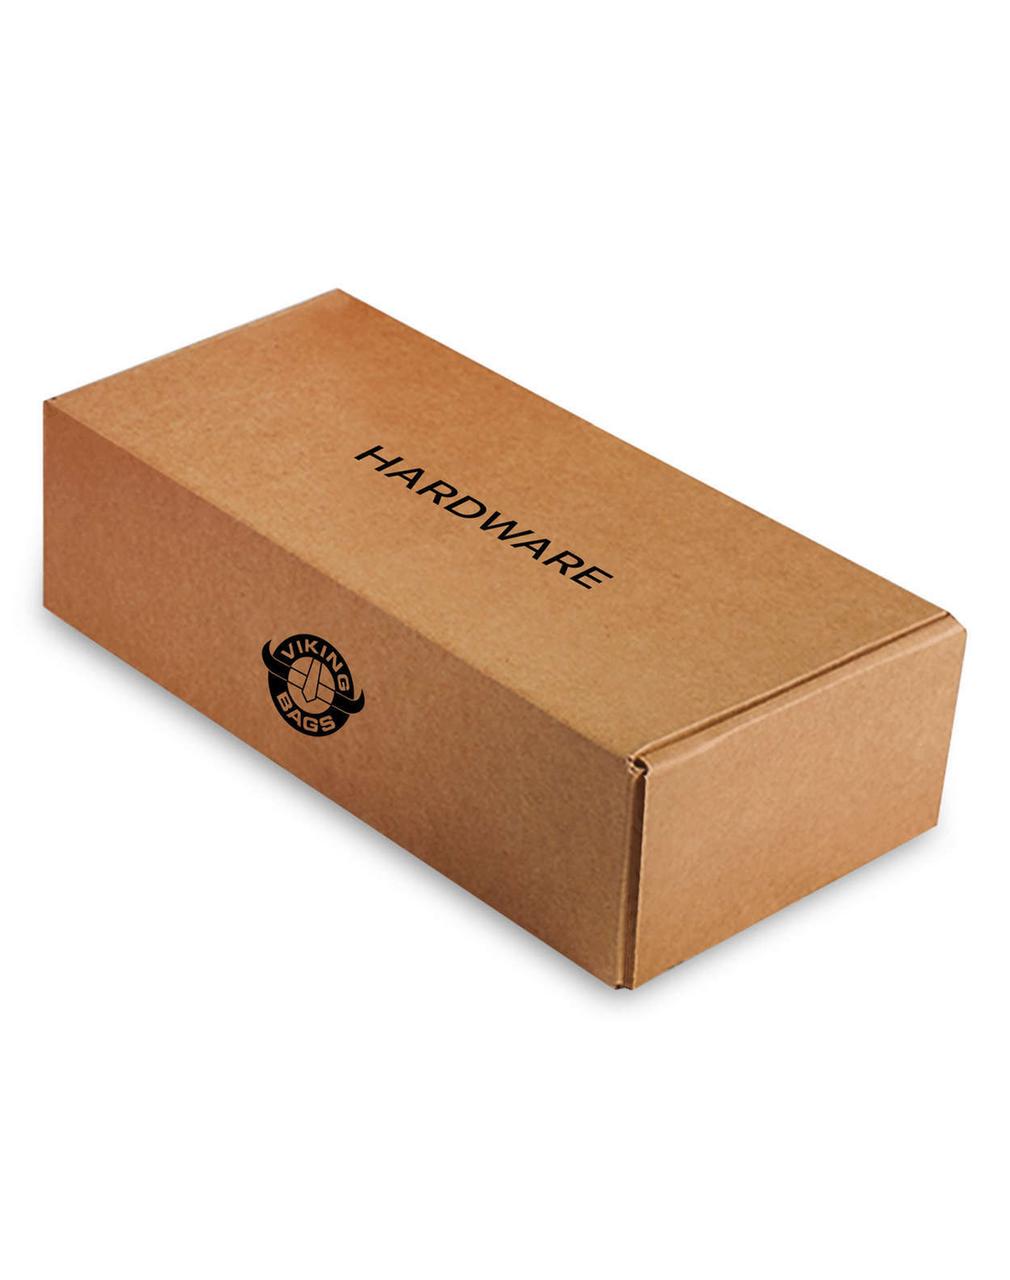 Honda 1100 Shadow Aero Viking Thor Series Small Leather Motorcycle Saddlebags Box